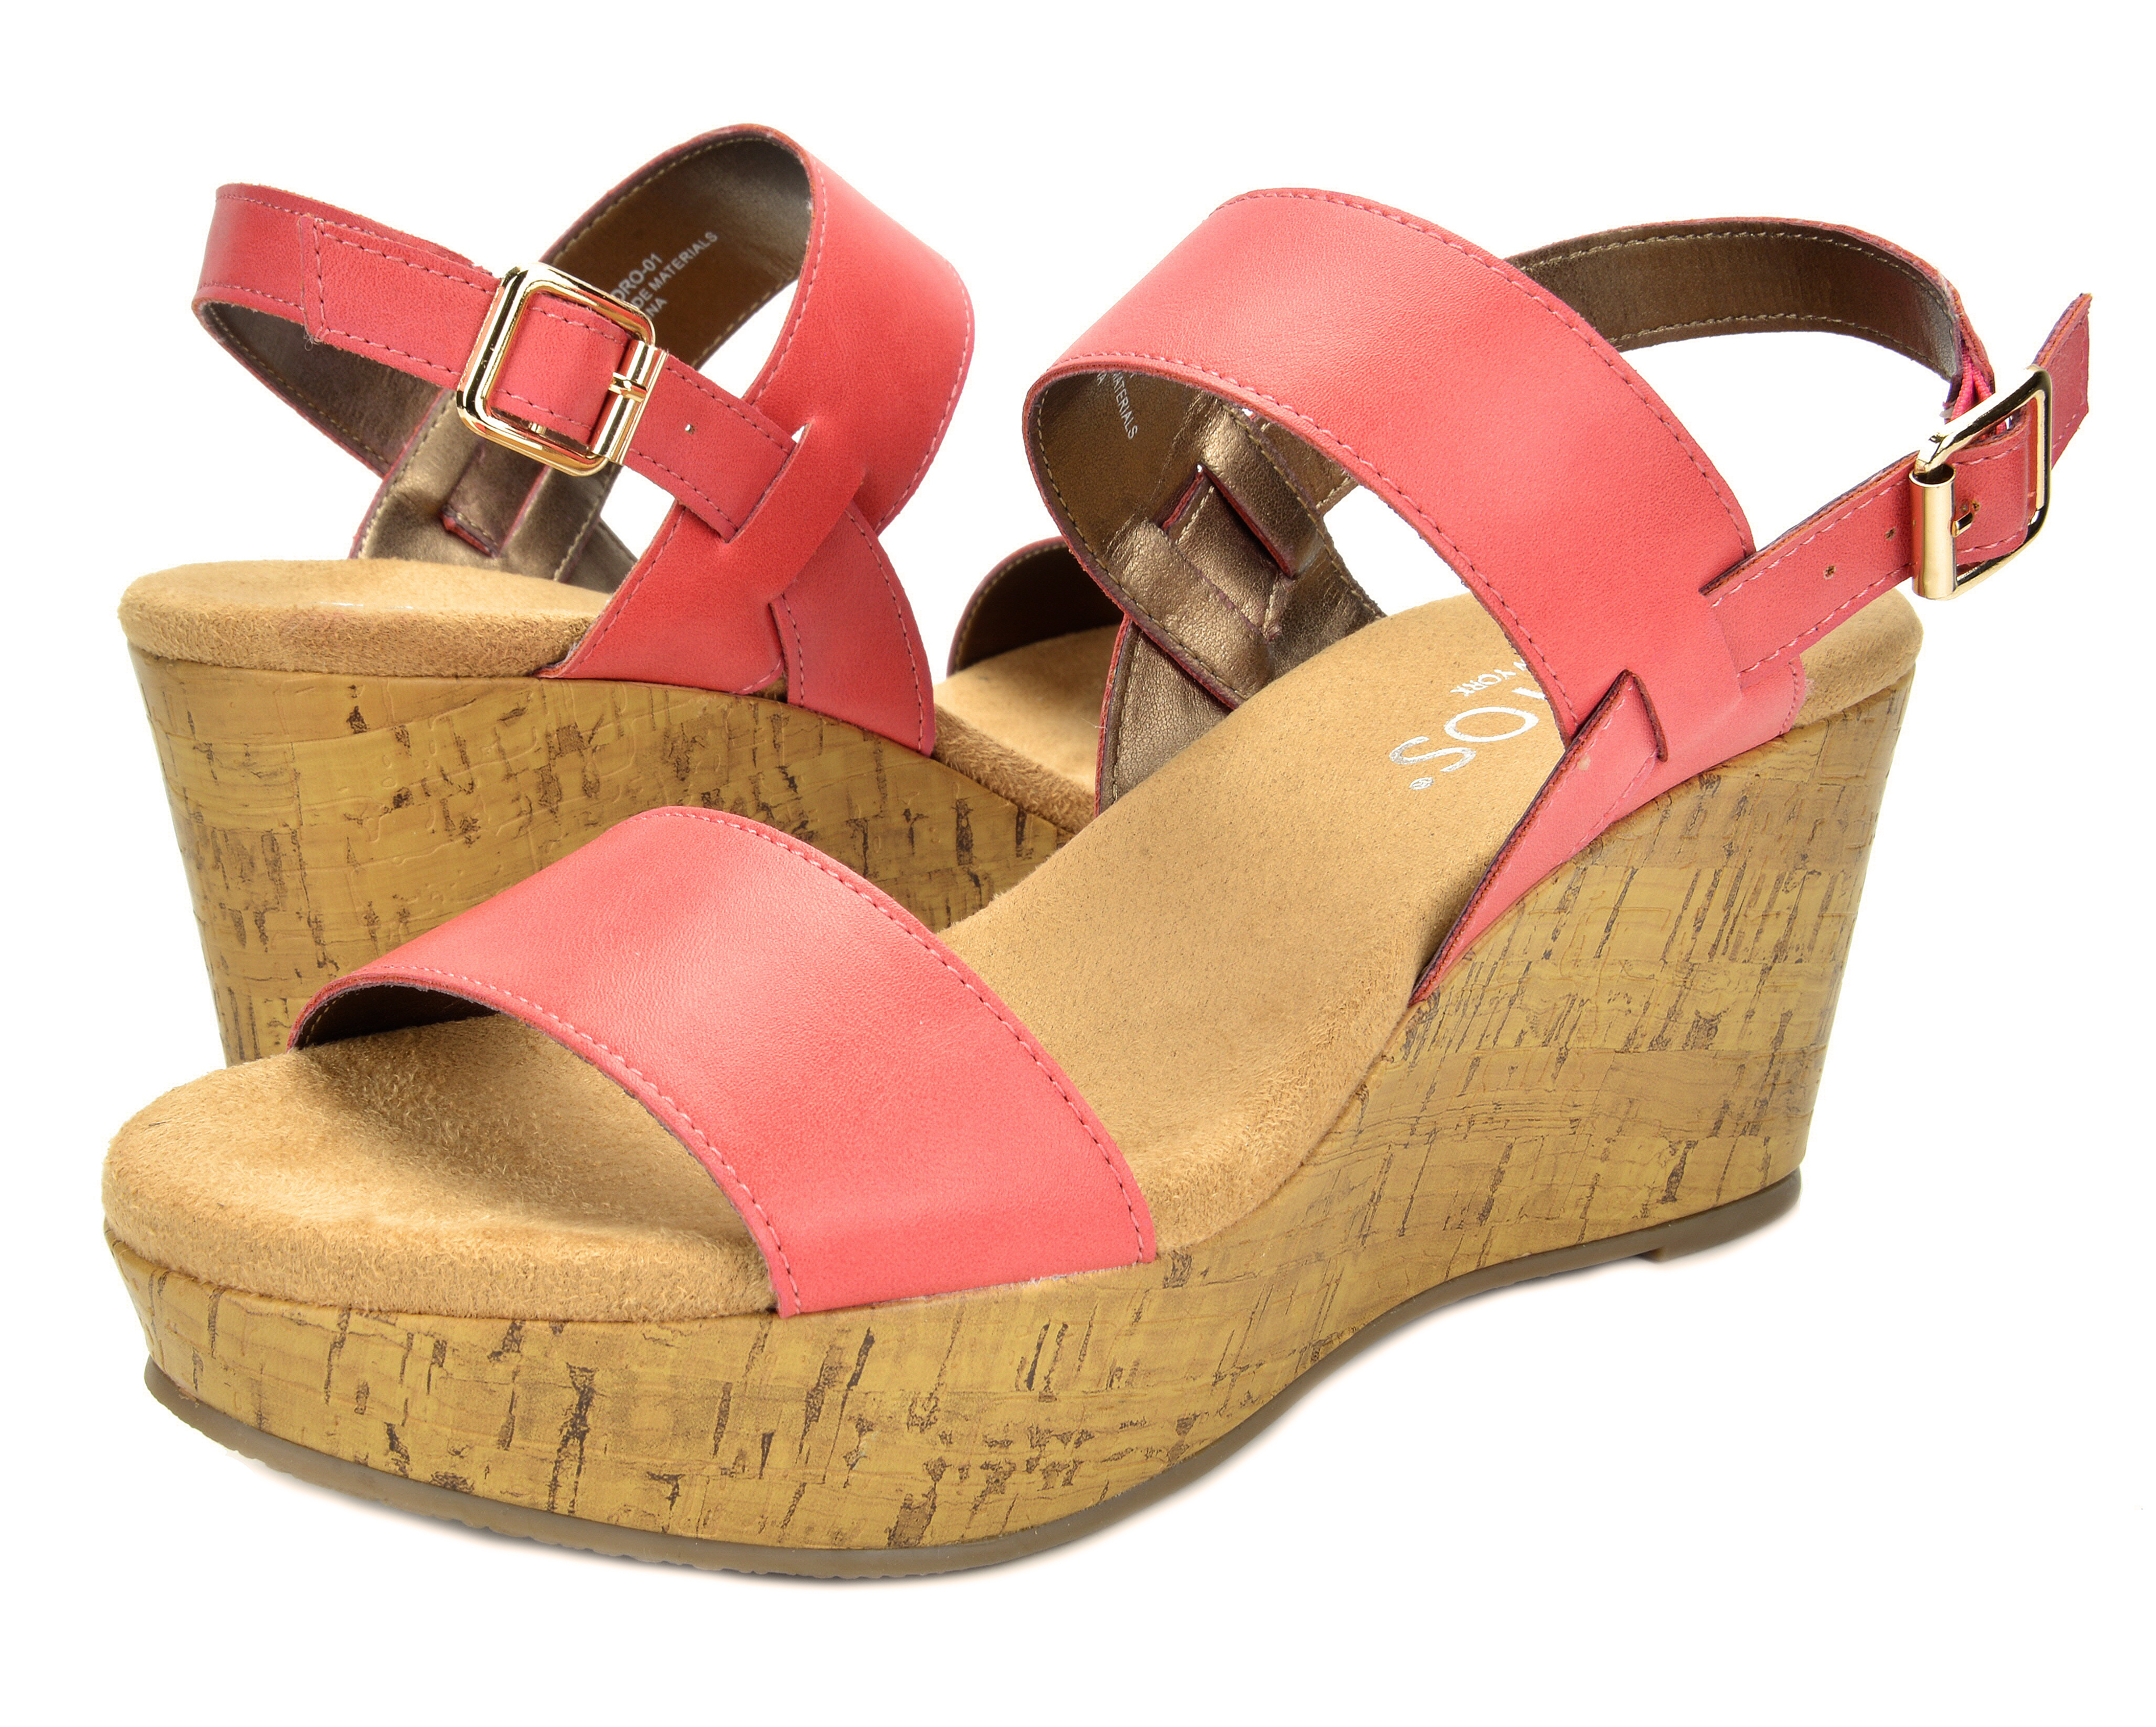 5fe8ecb5656a TOETOS Women SANDRO Summer Casual Ankle Strap Mid Heels Platform ...